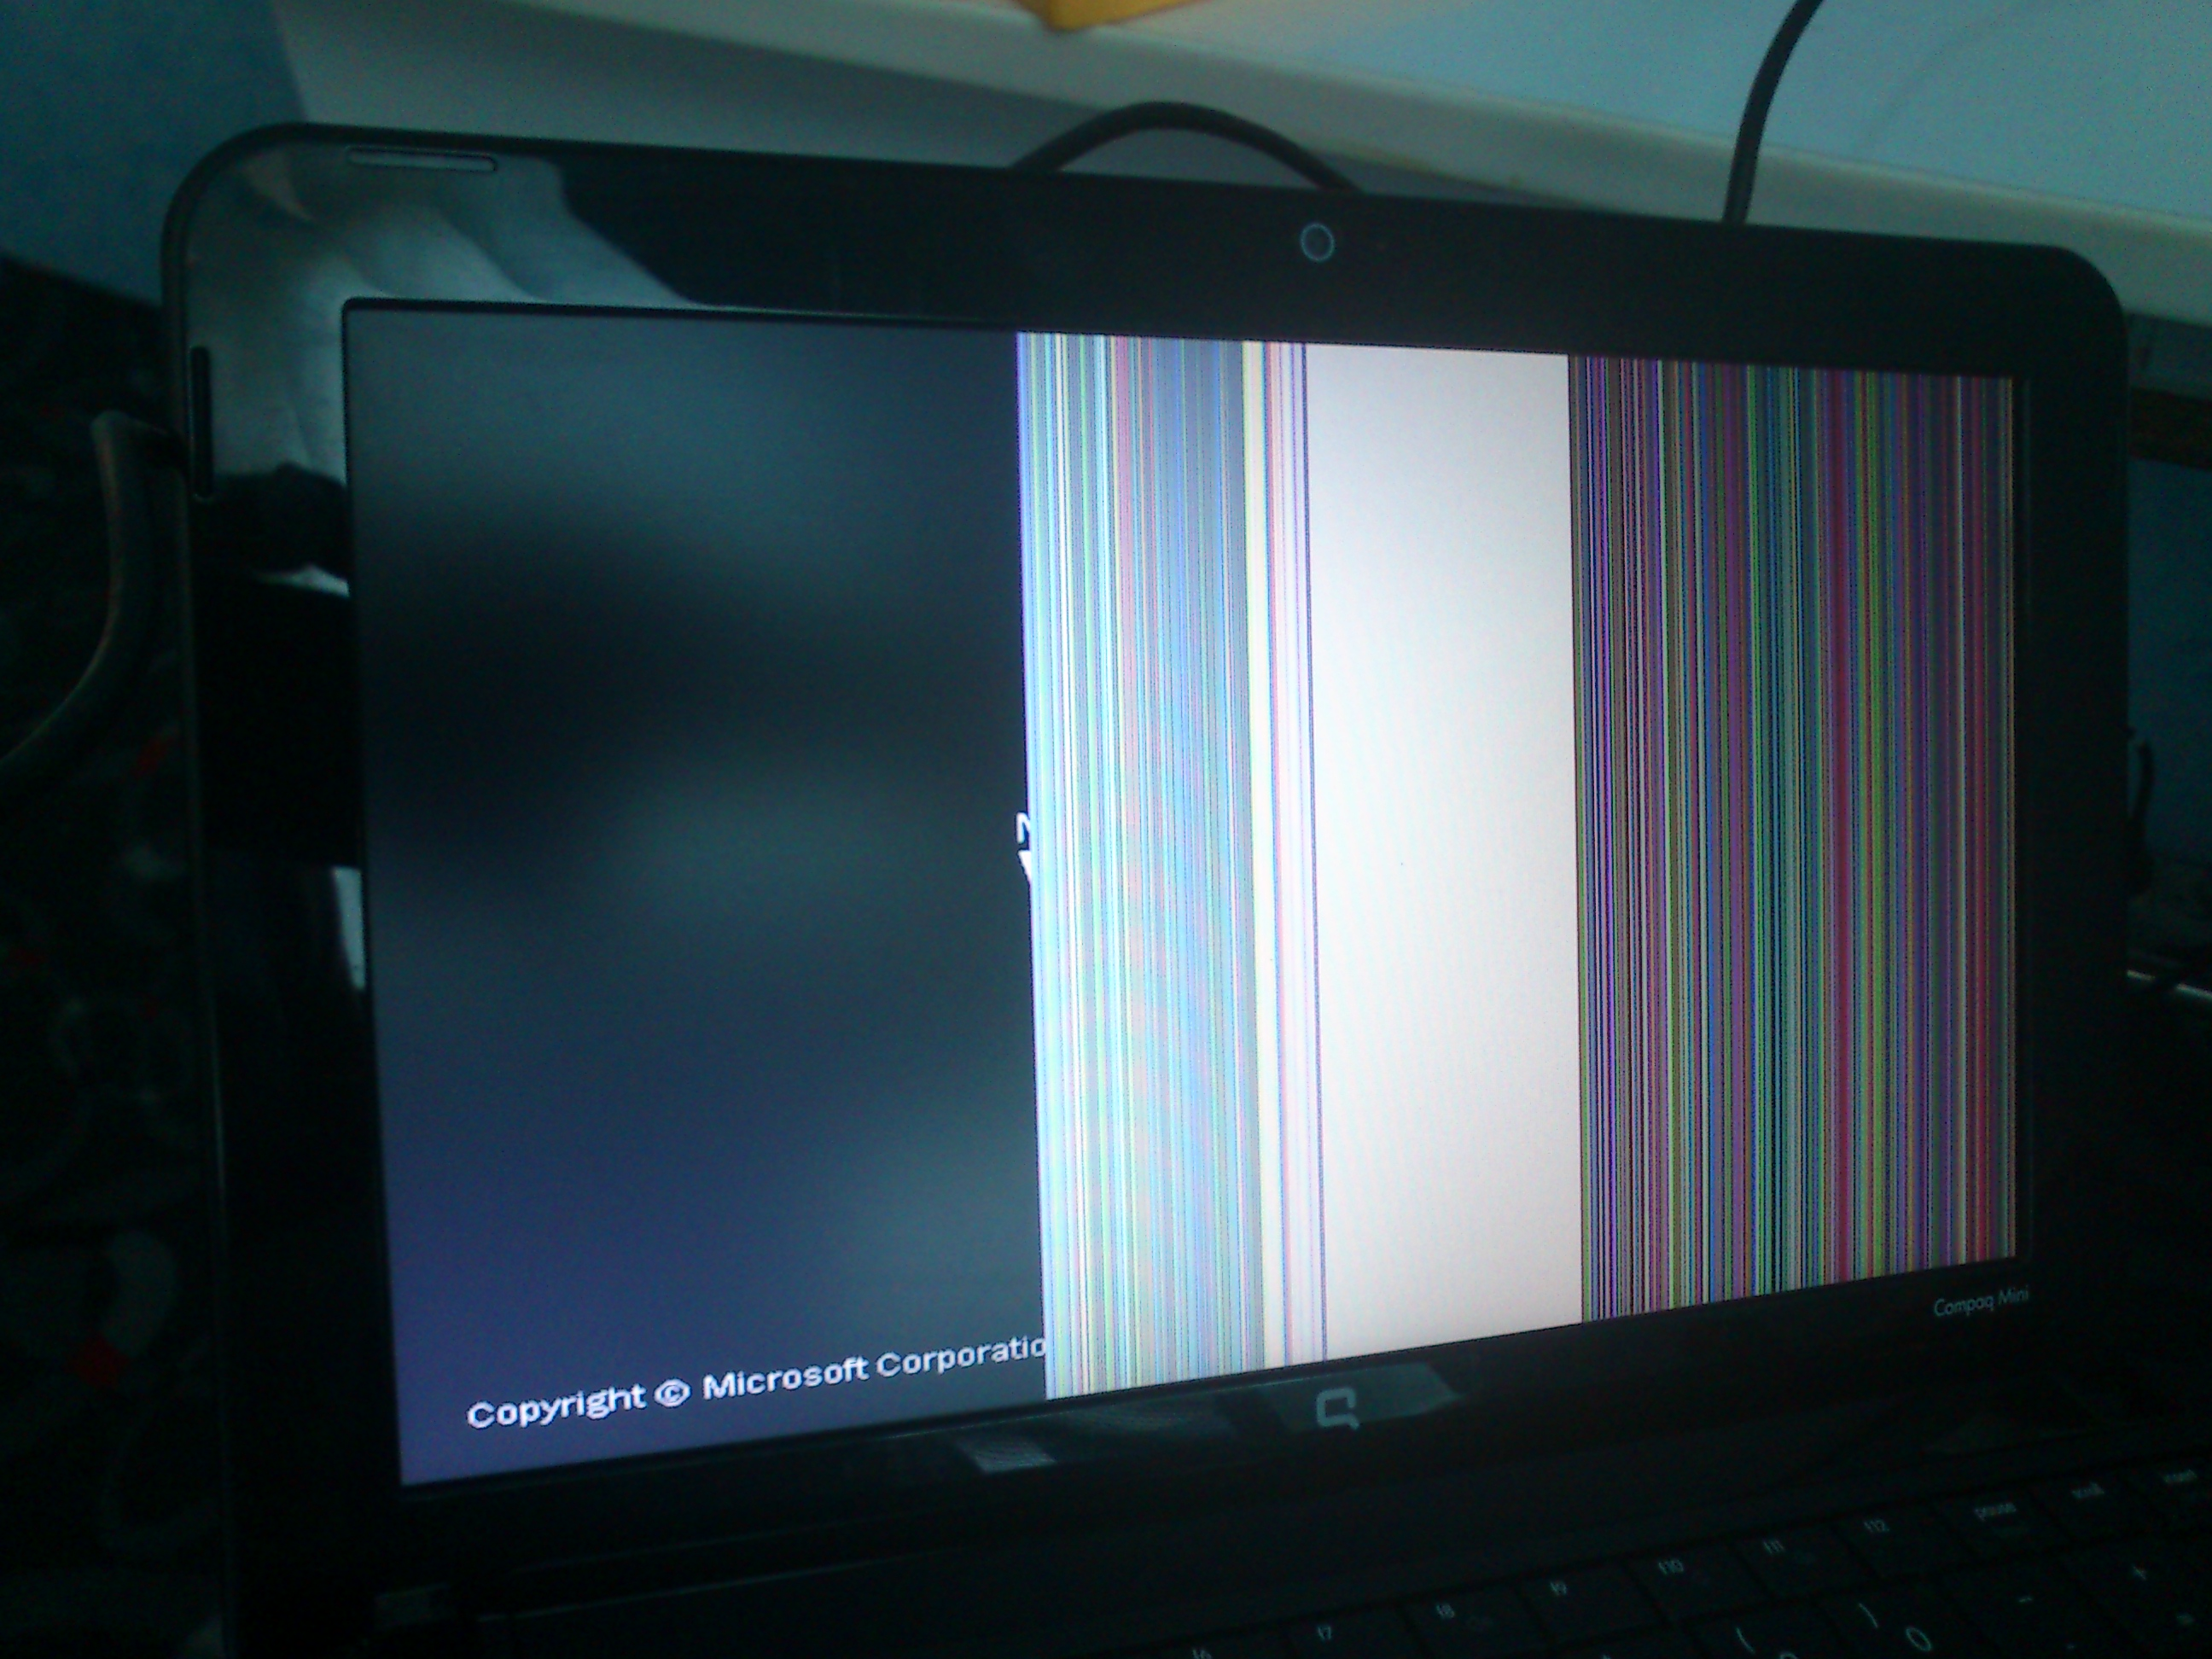 HP Compaq - Upadek notebooka, diagnoza (zdj�cie monitora)